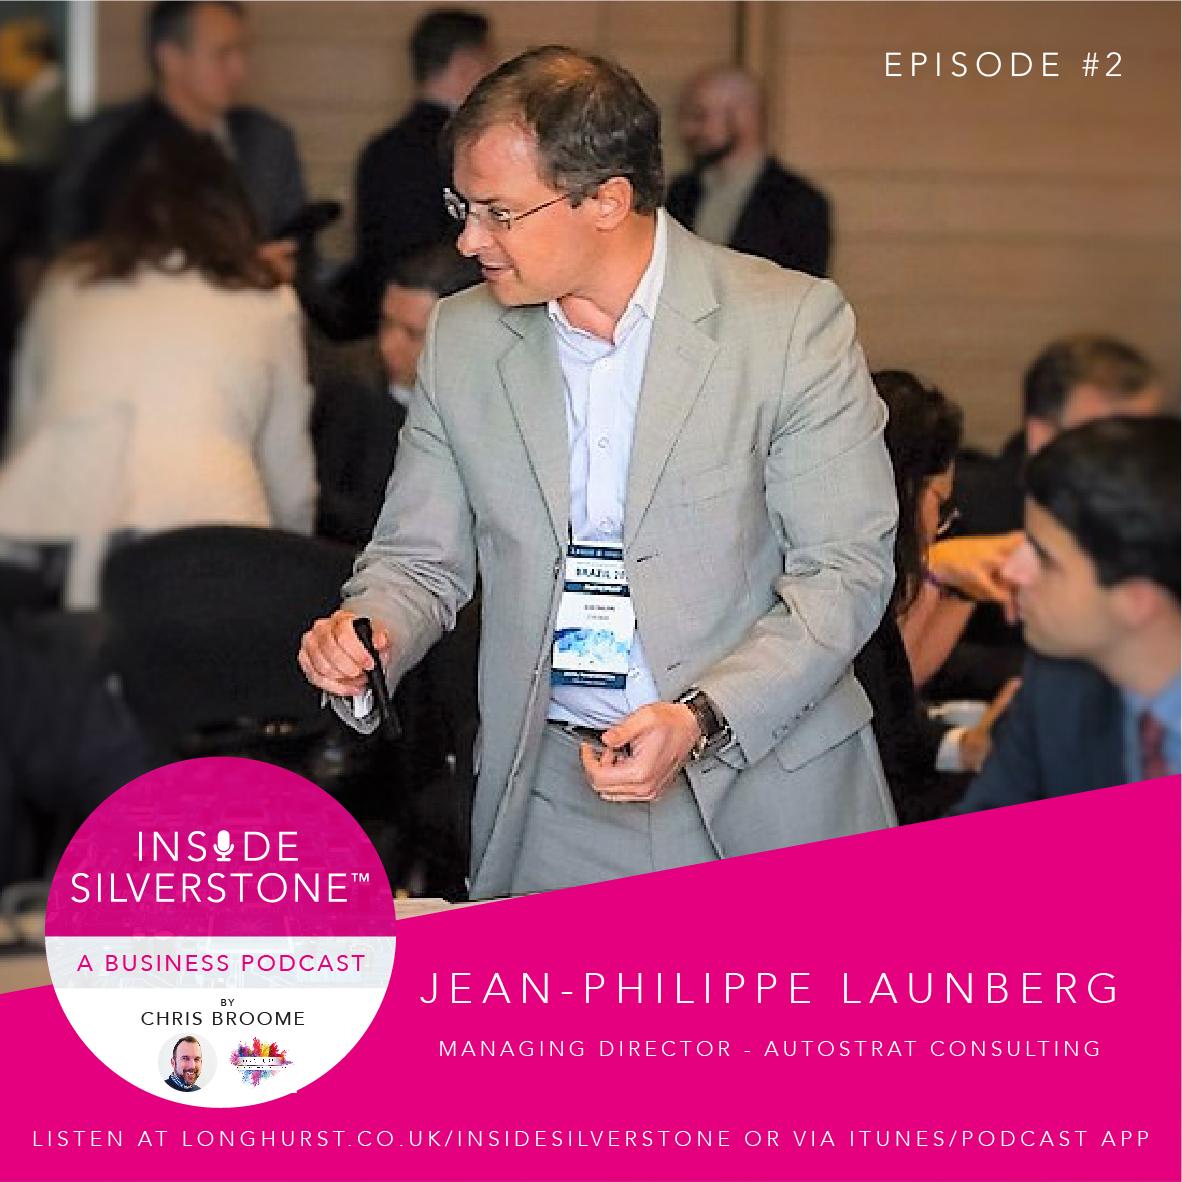 Jean-Philippe Launberg, Managing Director of AutoStrat Consulting